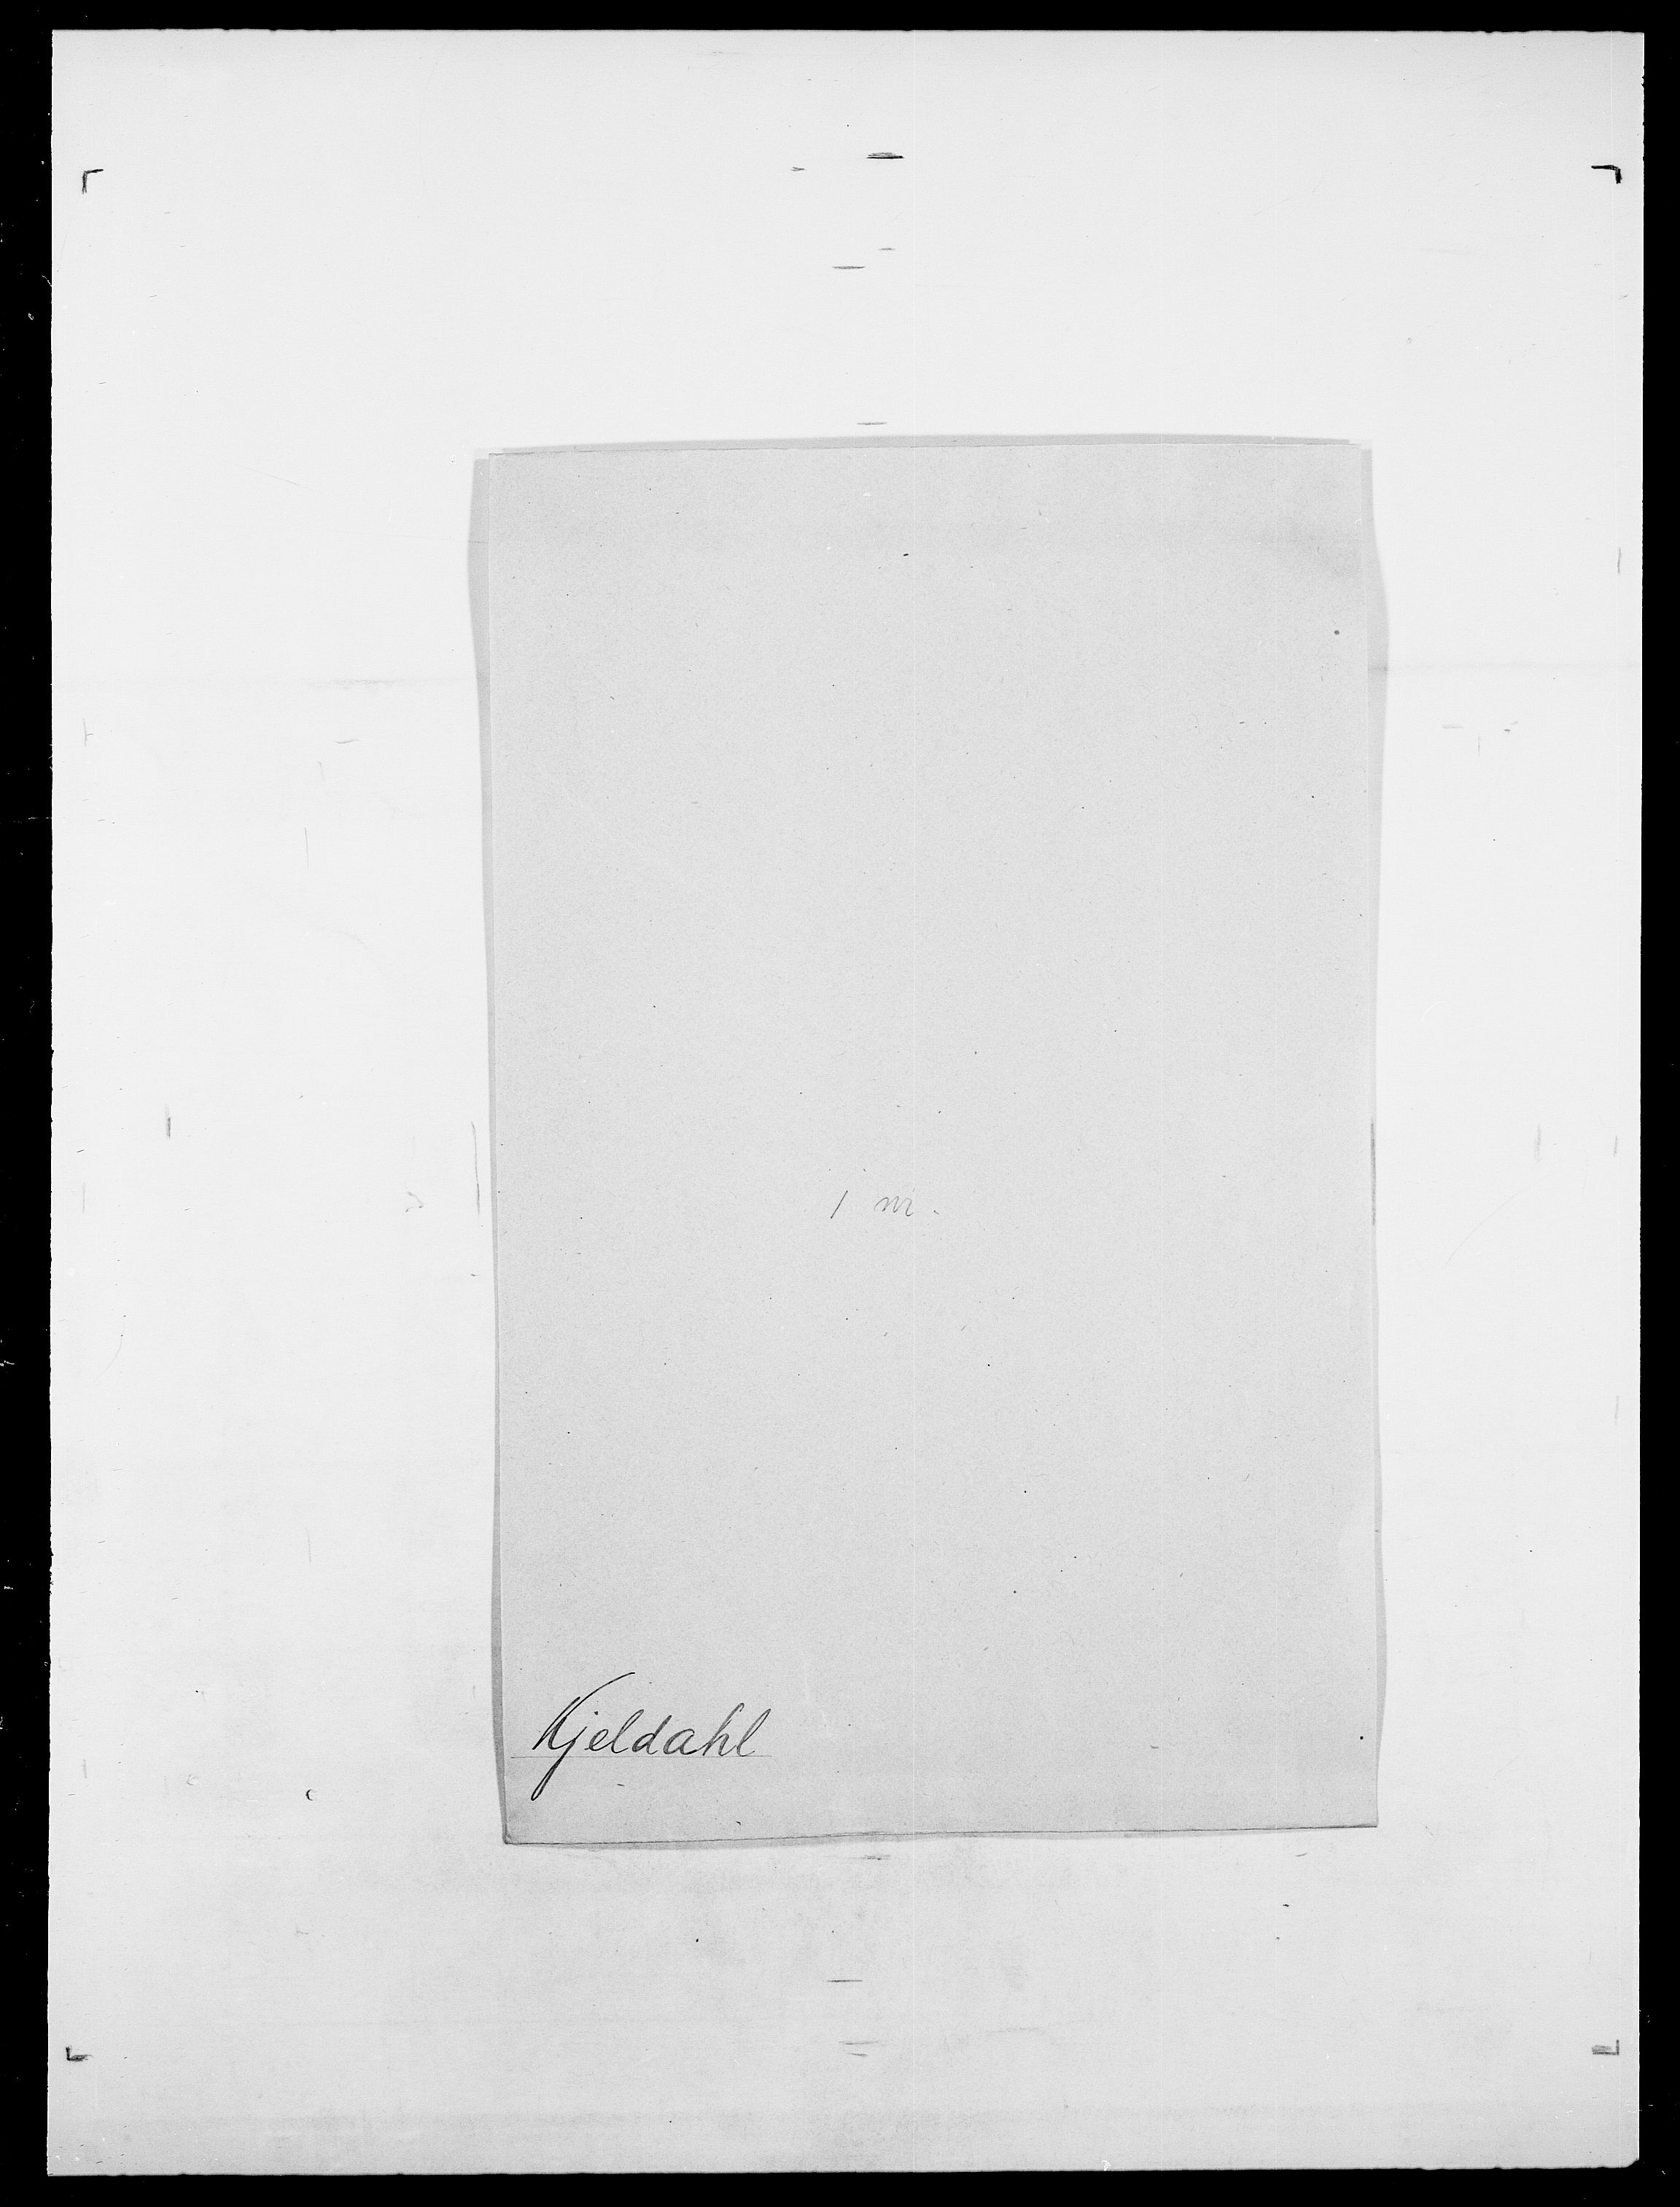 SAO, Delgobe, Charles Antoine - samling, D/Da/L0020: Irgens - Kjøsterud, s. 716